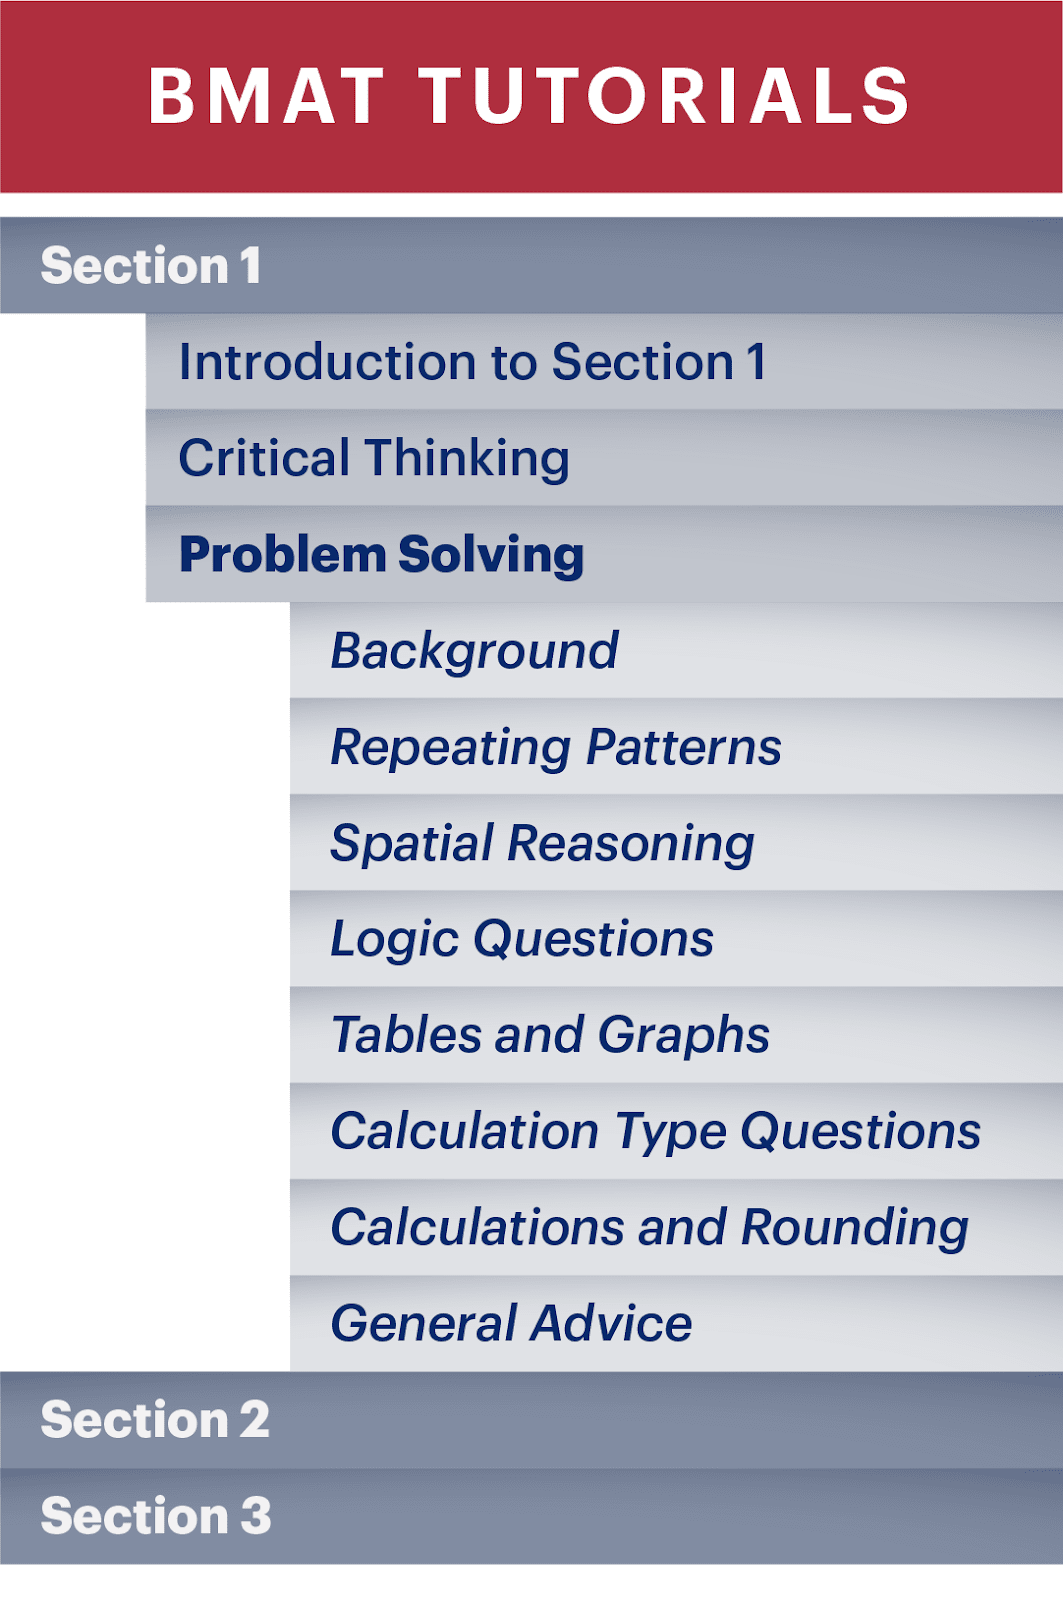 An example of BMAT tutorials list in Medify's Online BMAT Course